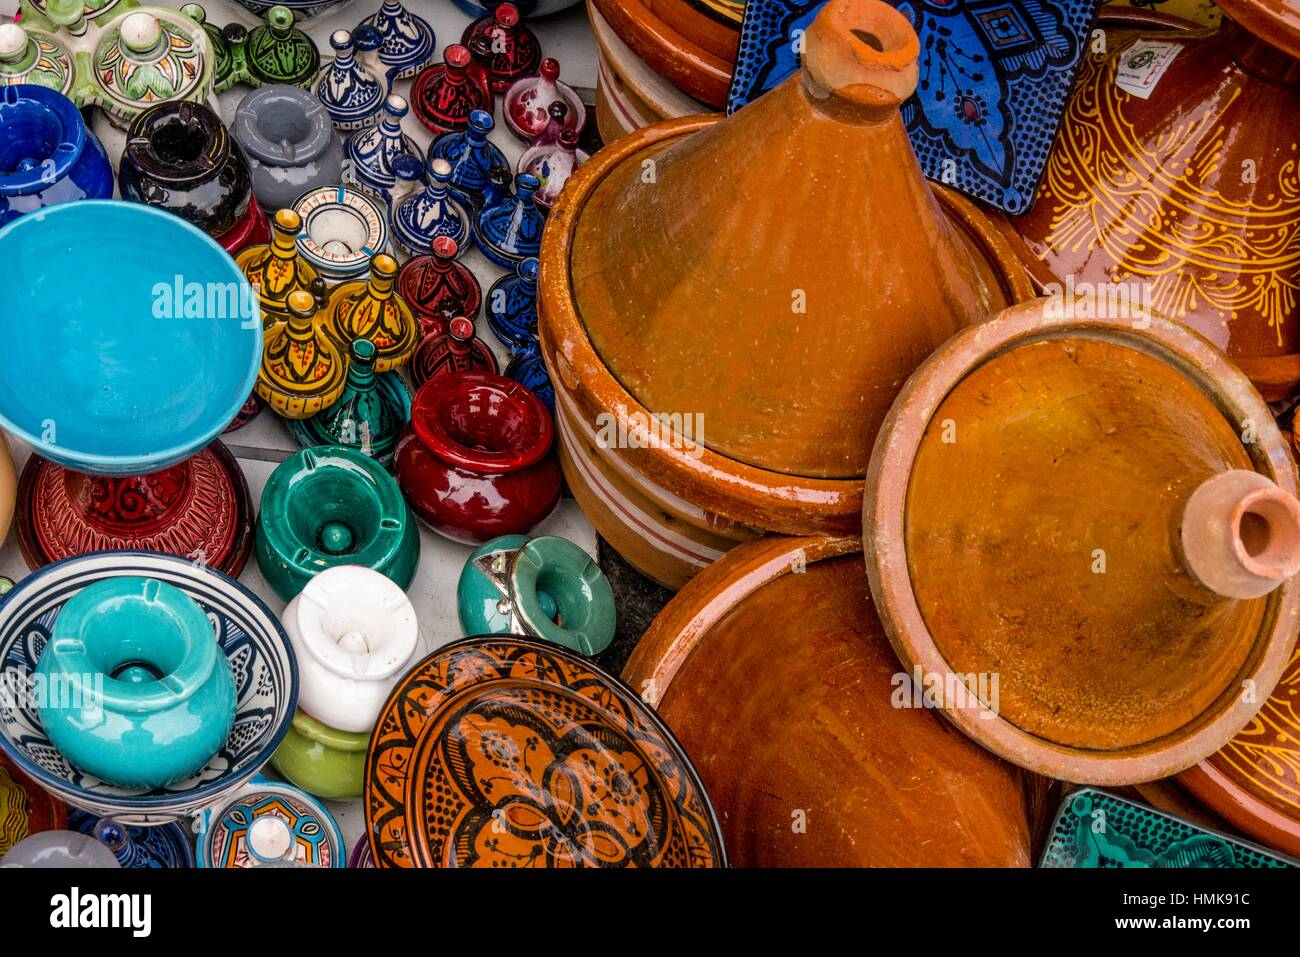 Handicrafts, ceramics, Morocco - Stock Image